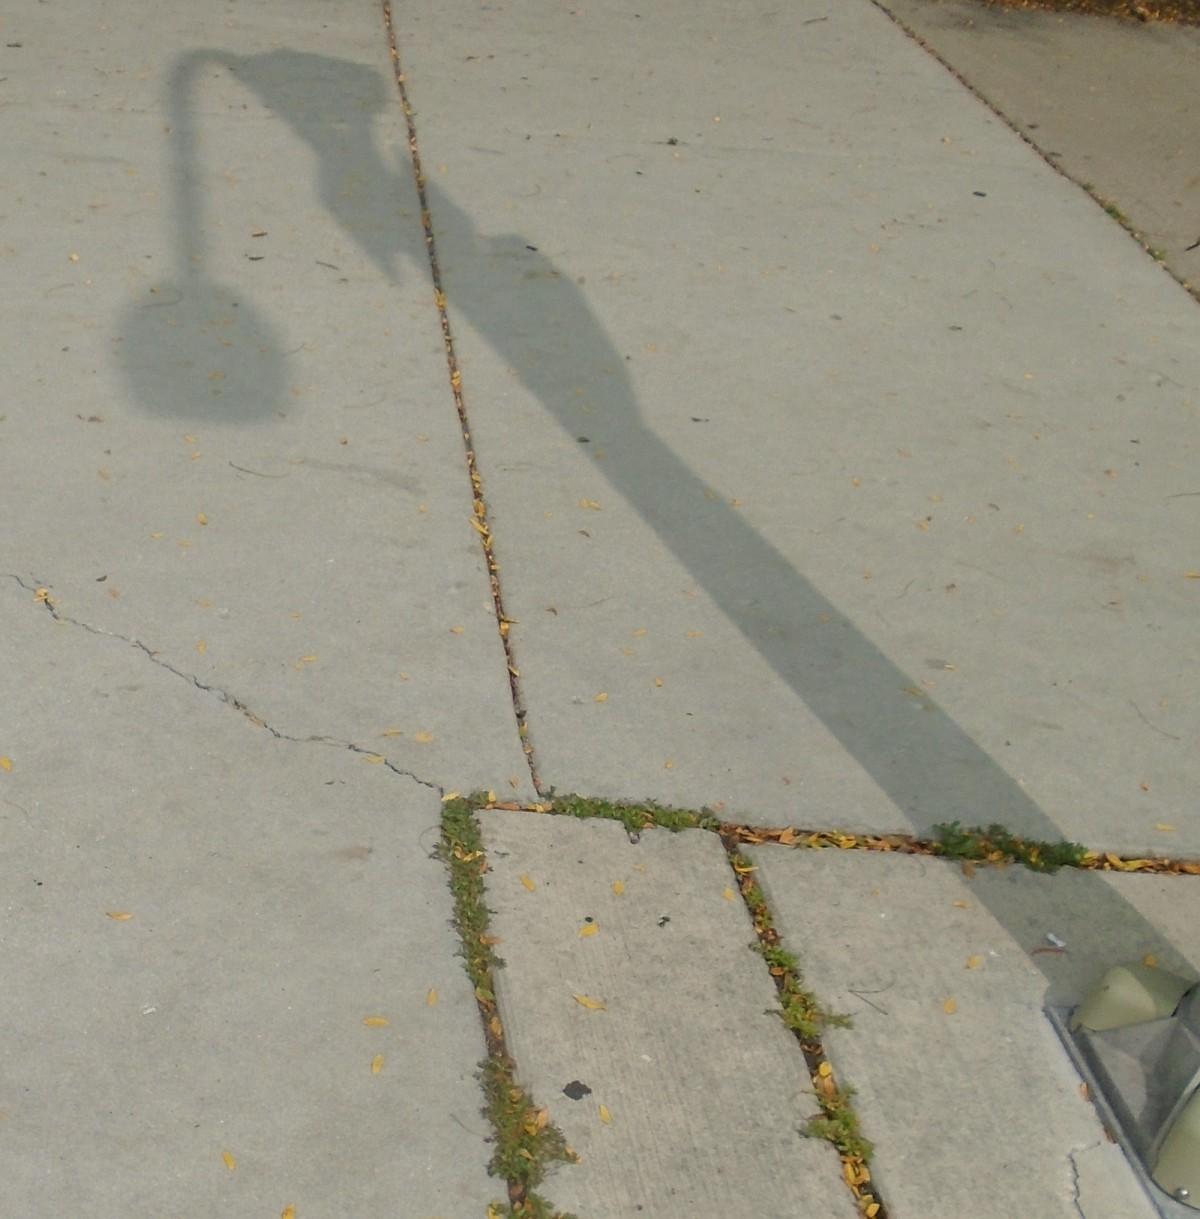 Portrait of a Streetlight as aShowerhead